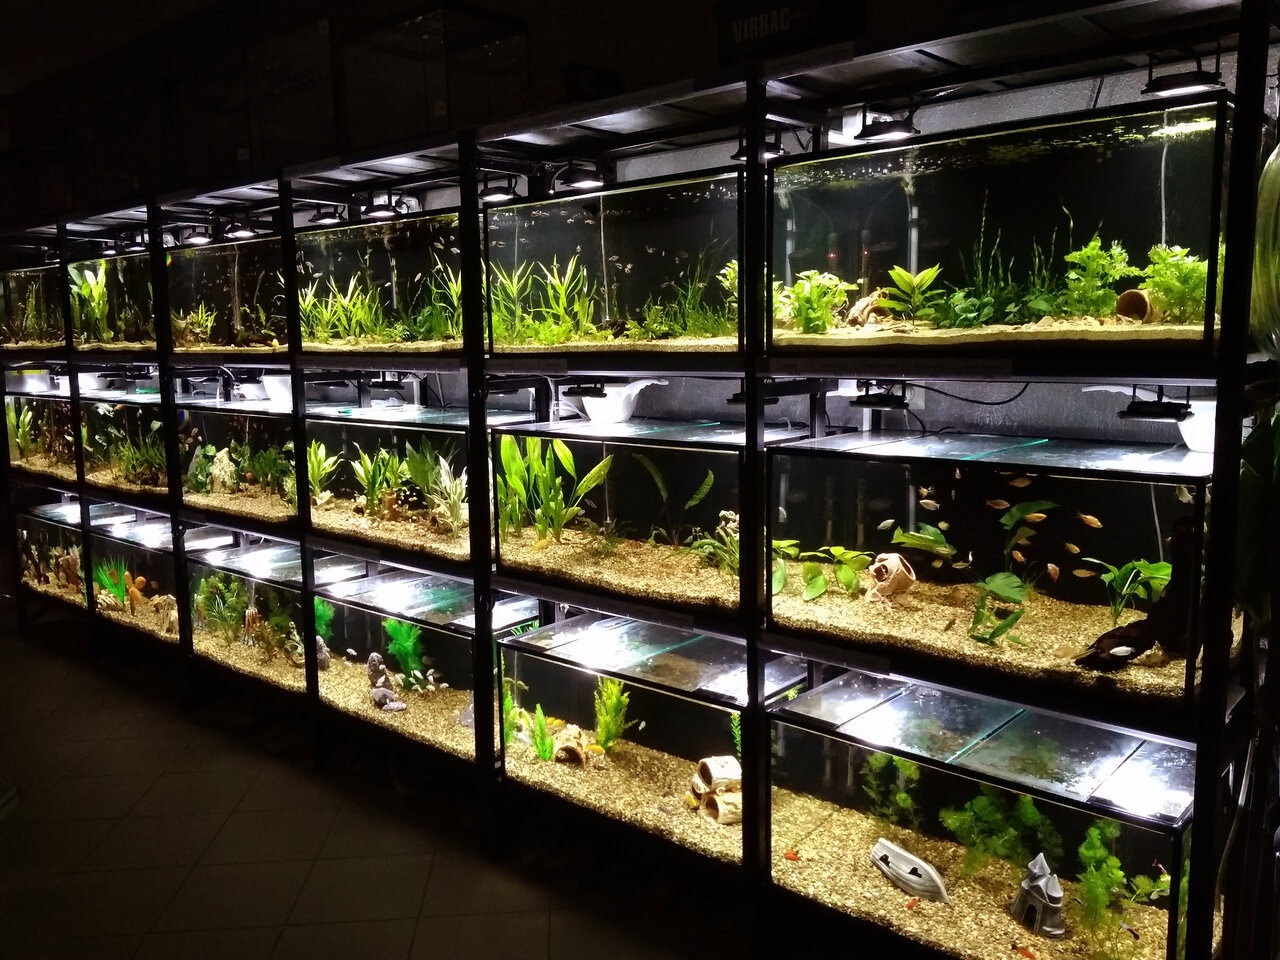 картинки аквариумного магазина листья всех, кто